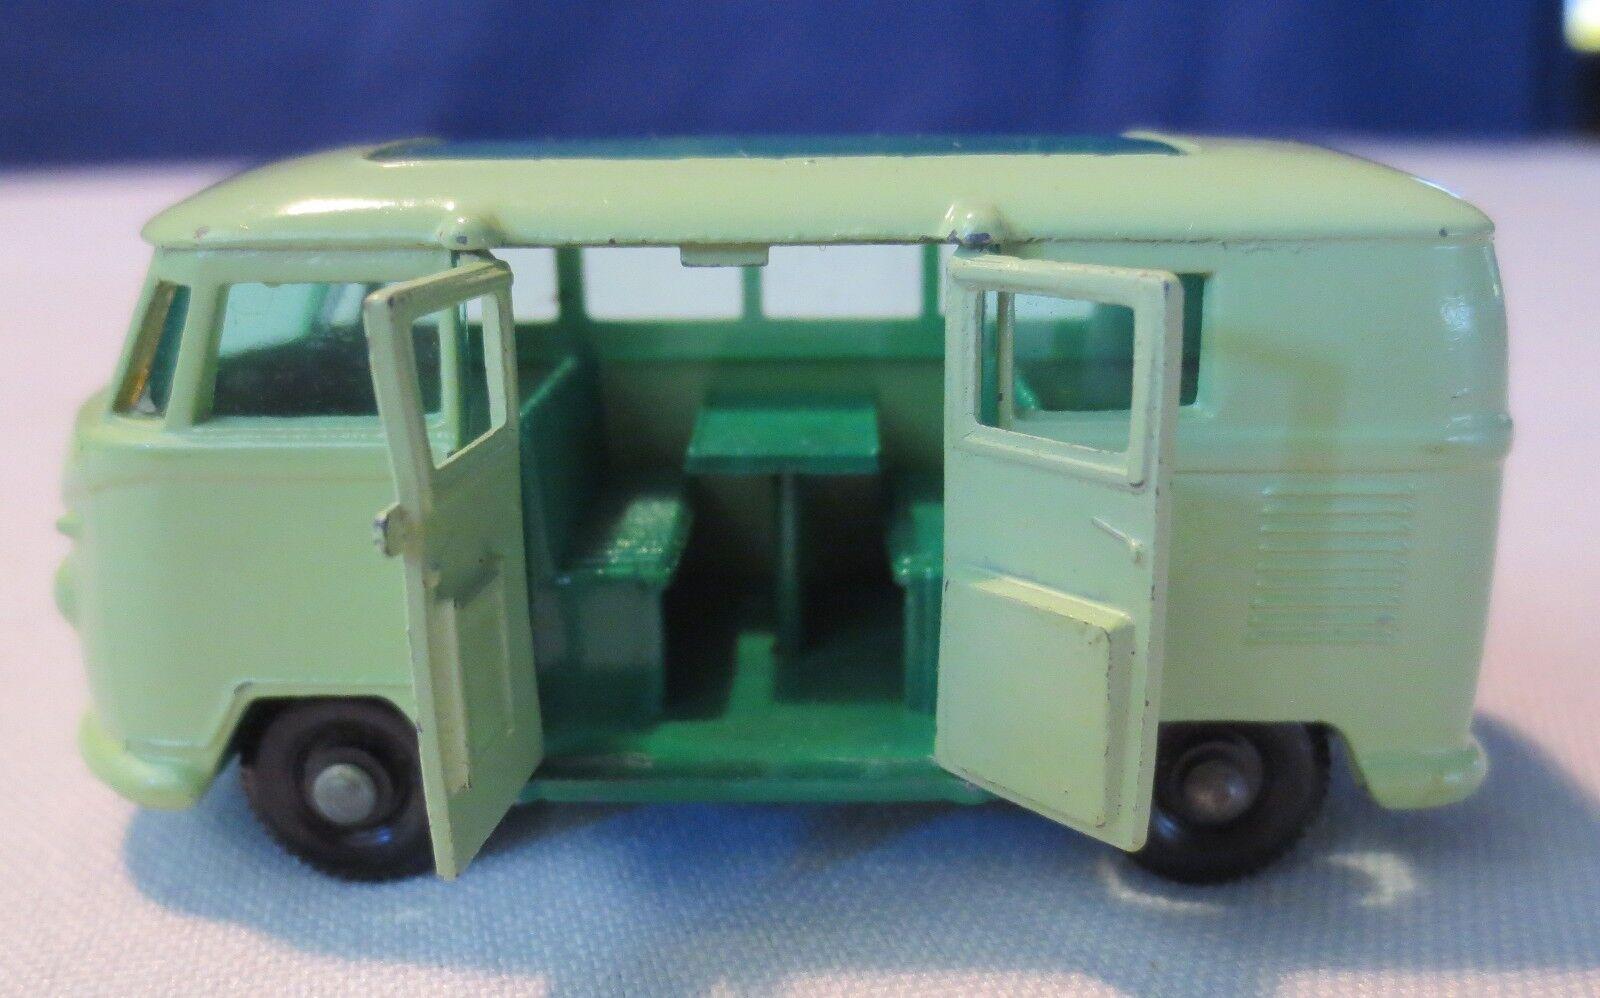 MATCHscatola Lesney 34 verde Volkswagon autoavette camper apertura porta senza scatola